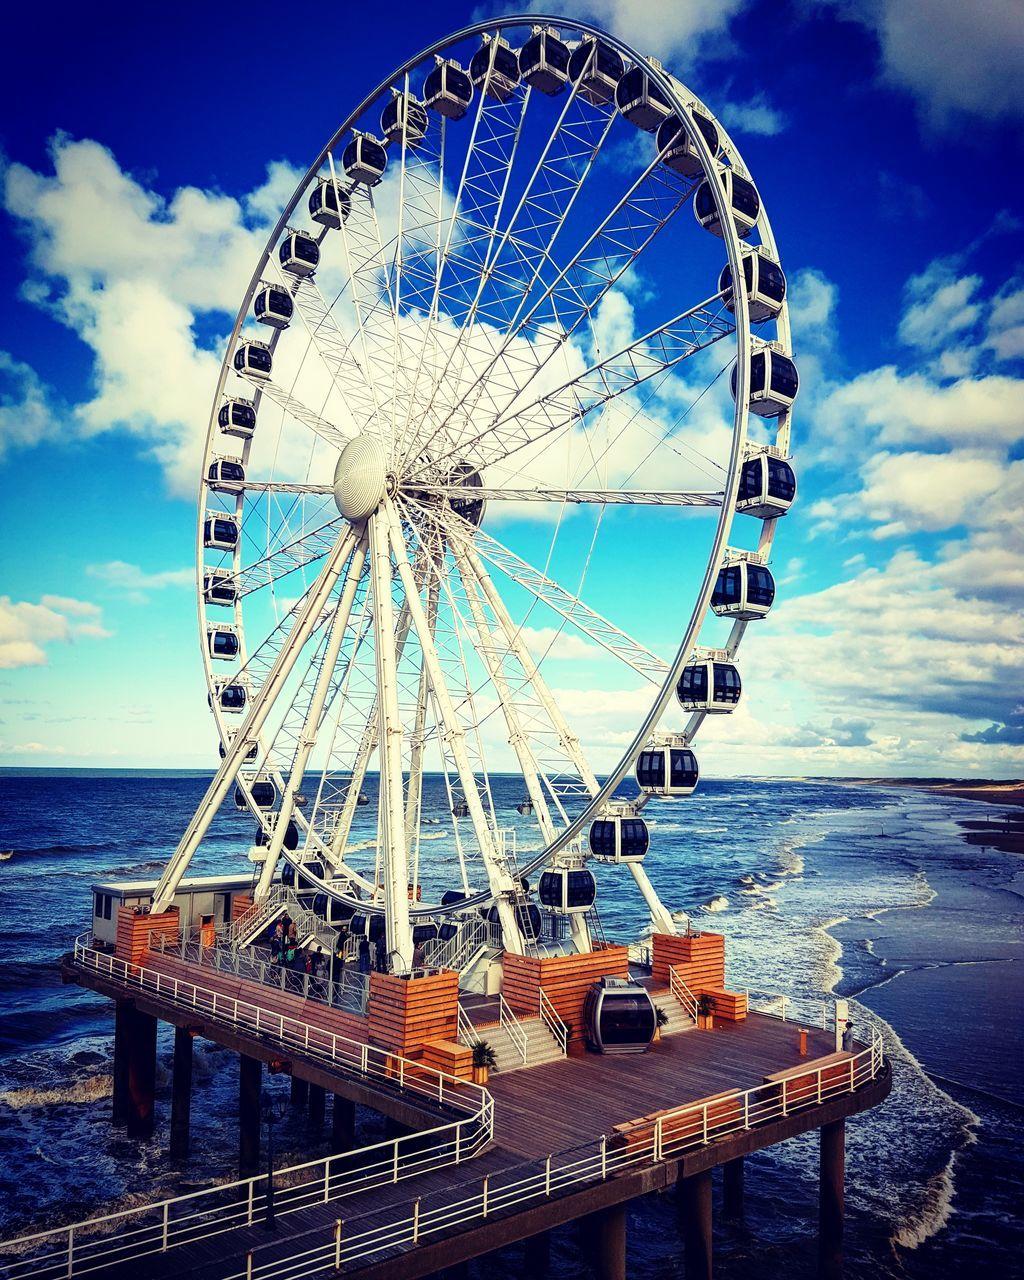 sea, sky, water, cloud - sky, ferris wheel, horizon over water, outdoors, day, no people, big wheel, blue, nautical vessel, nature, close-up